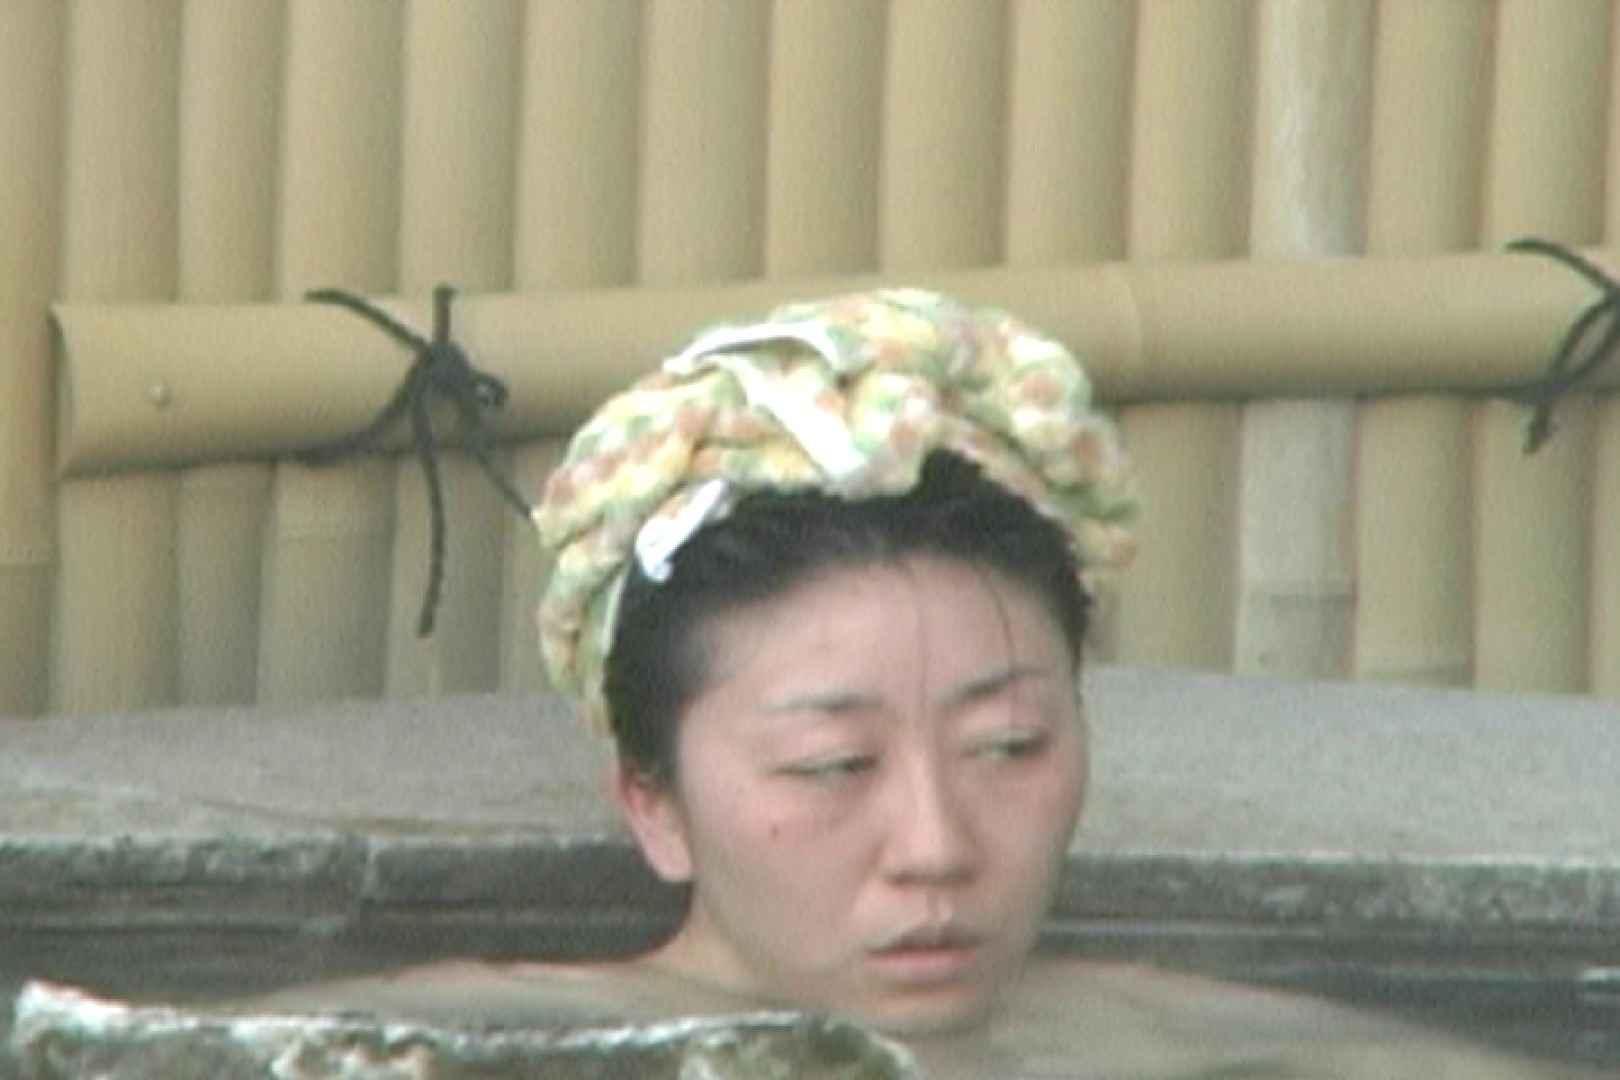 Aquaな露天風呂Vol.594 盗撮師作品  79pic 45